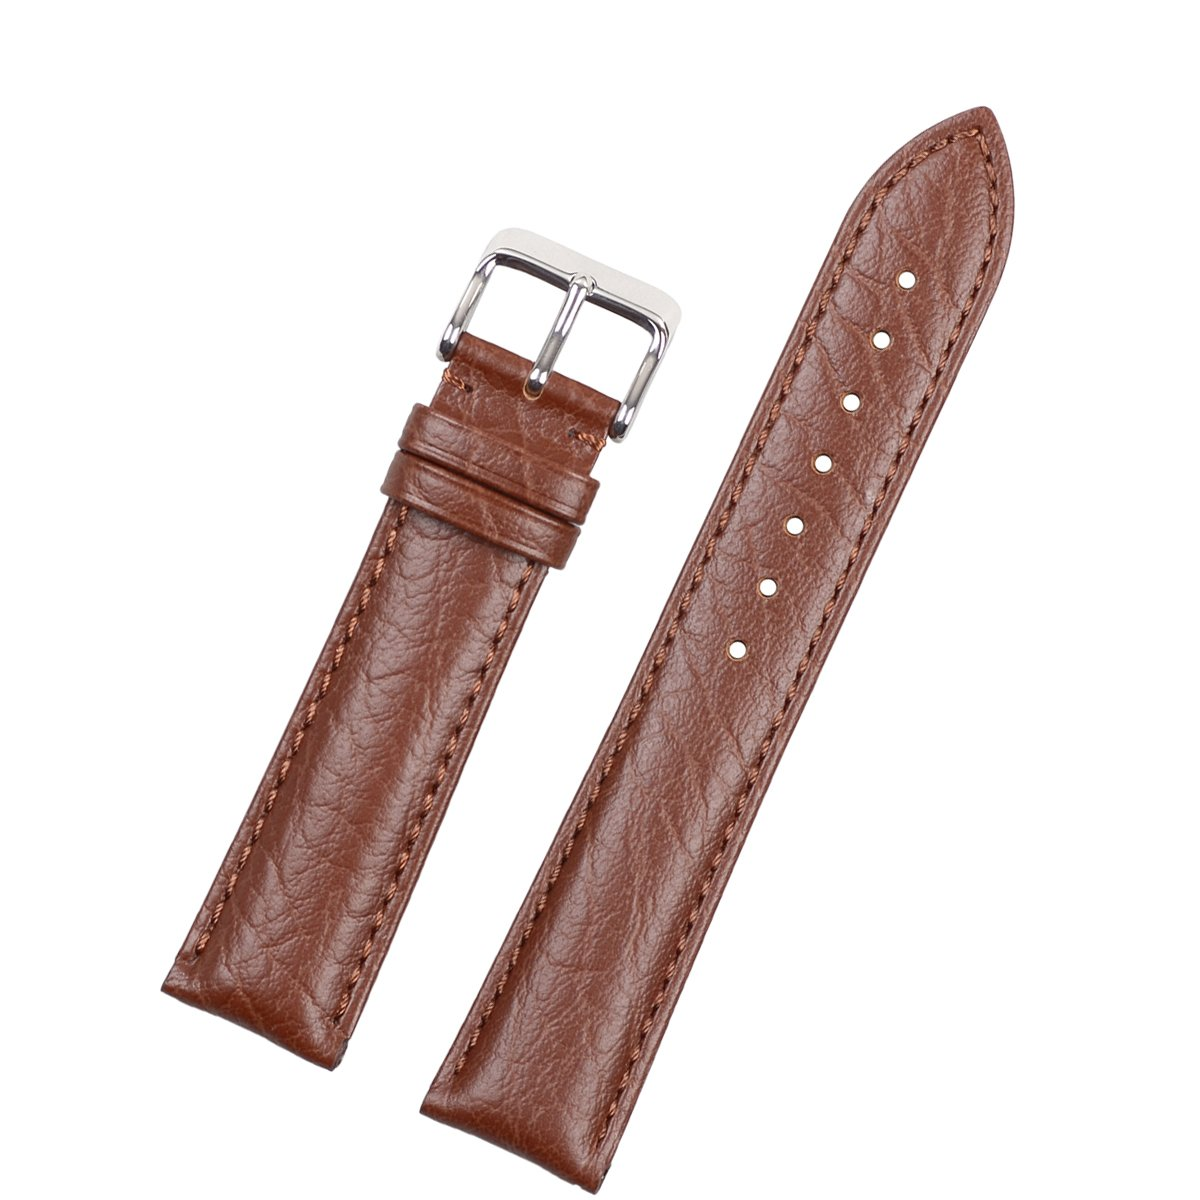 eache Classical超薄型本革バンド腕時計ストラップ異なる色 20mm Brown Brown Thread-S 20mm|Brown Brown Thread-S Brown Brown Thread-S 20mm B07D36PV5K